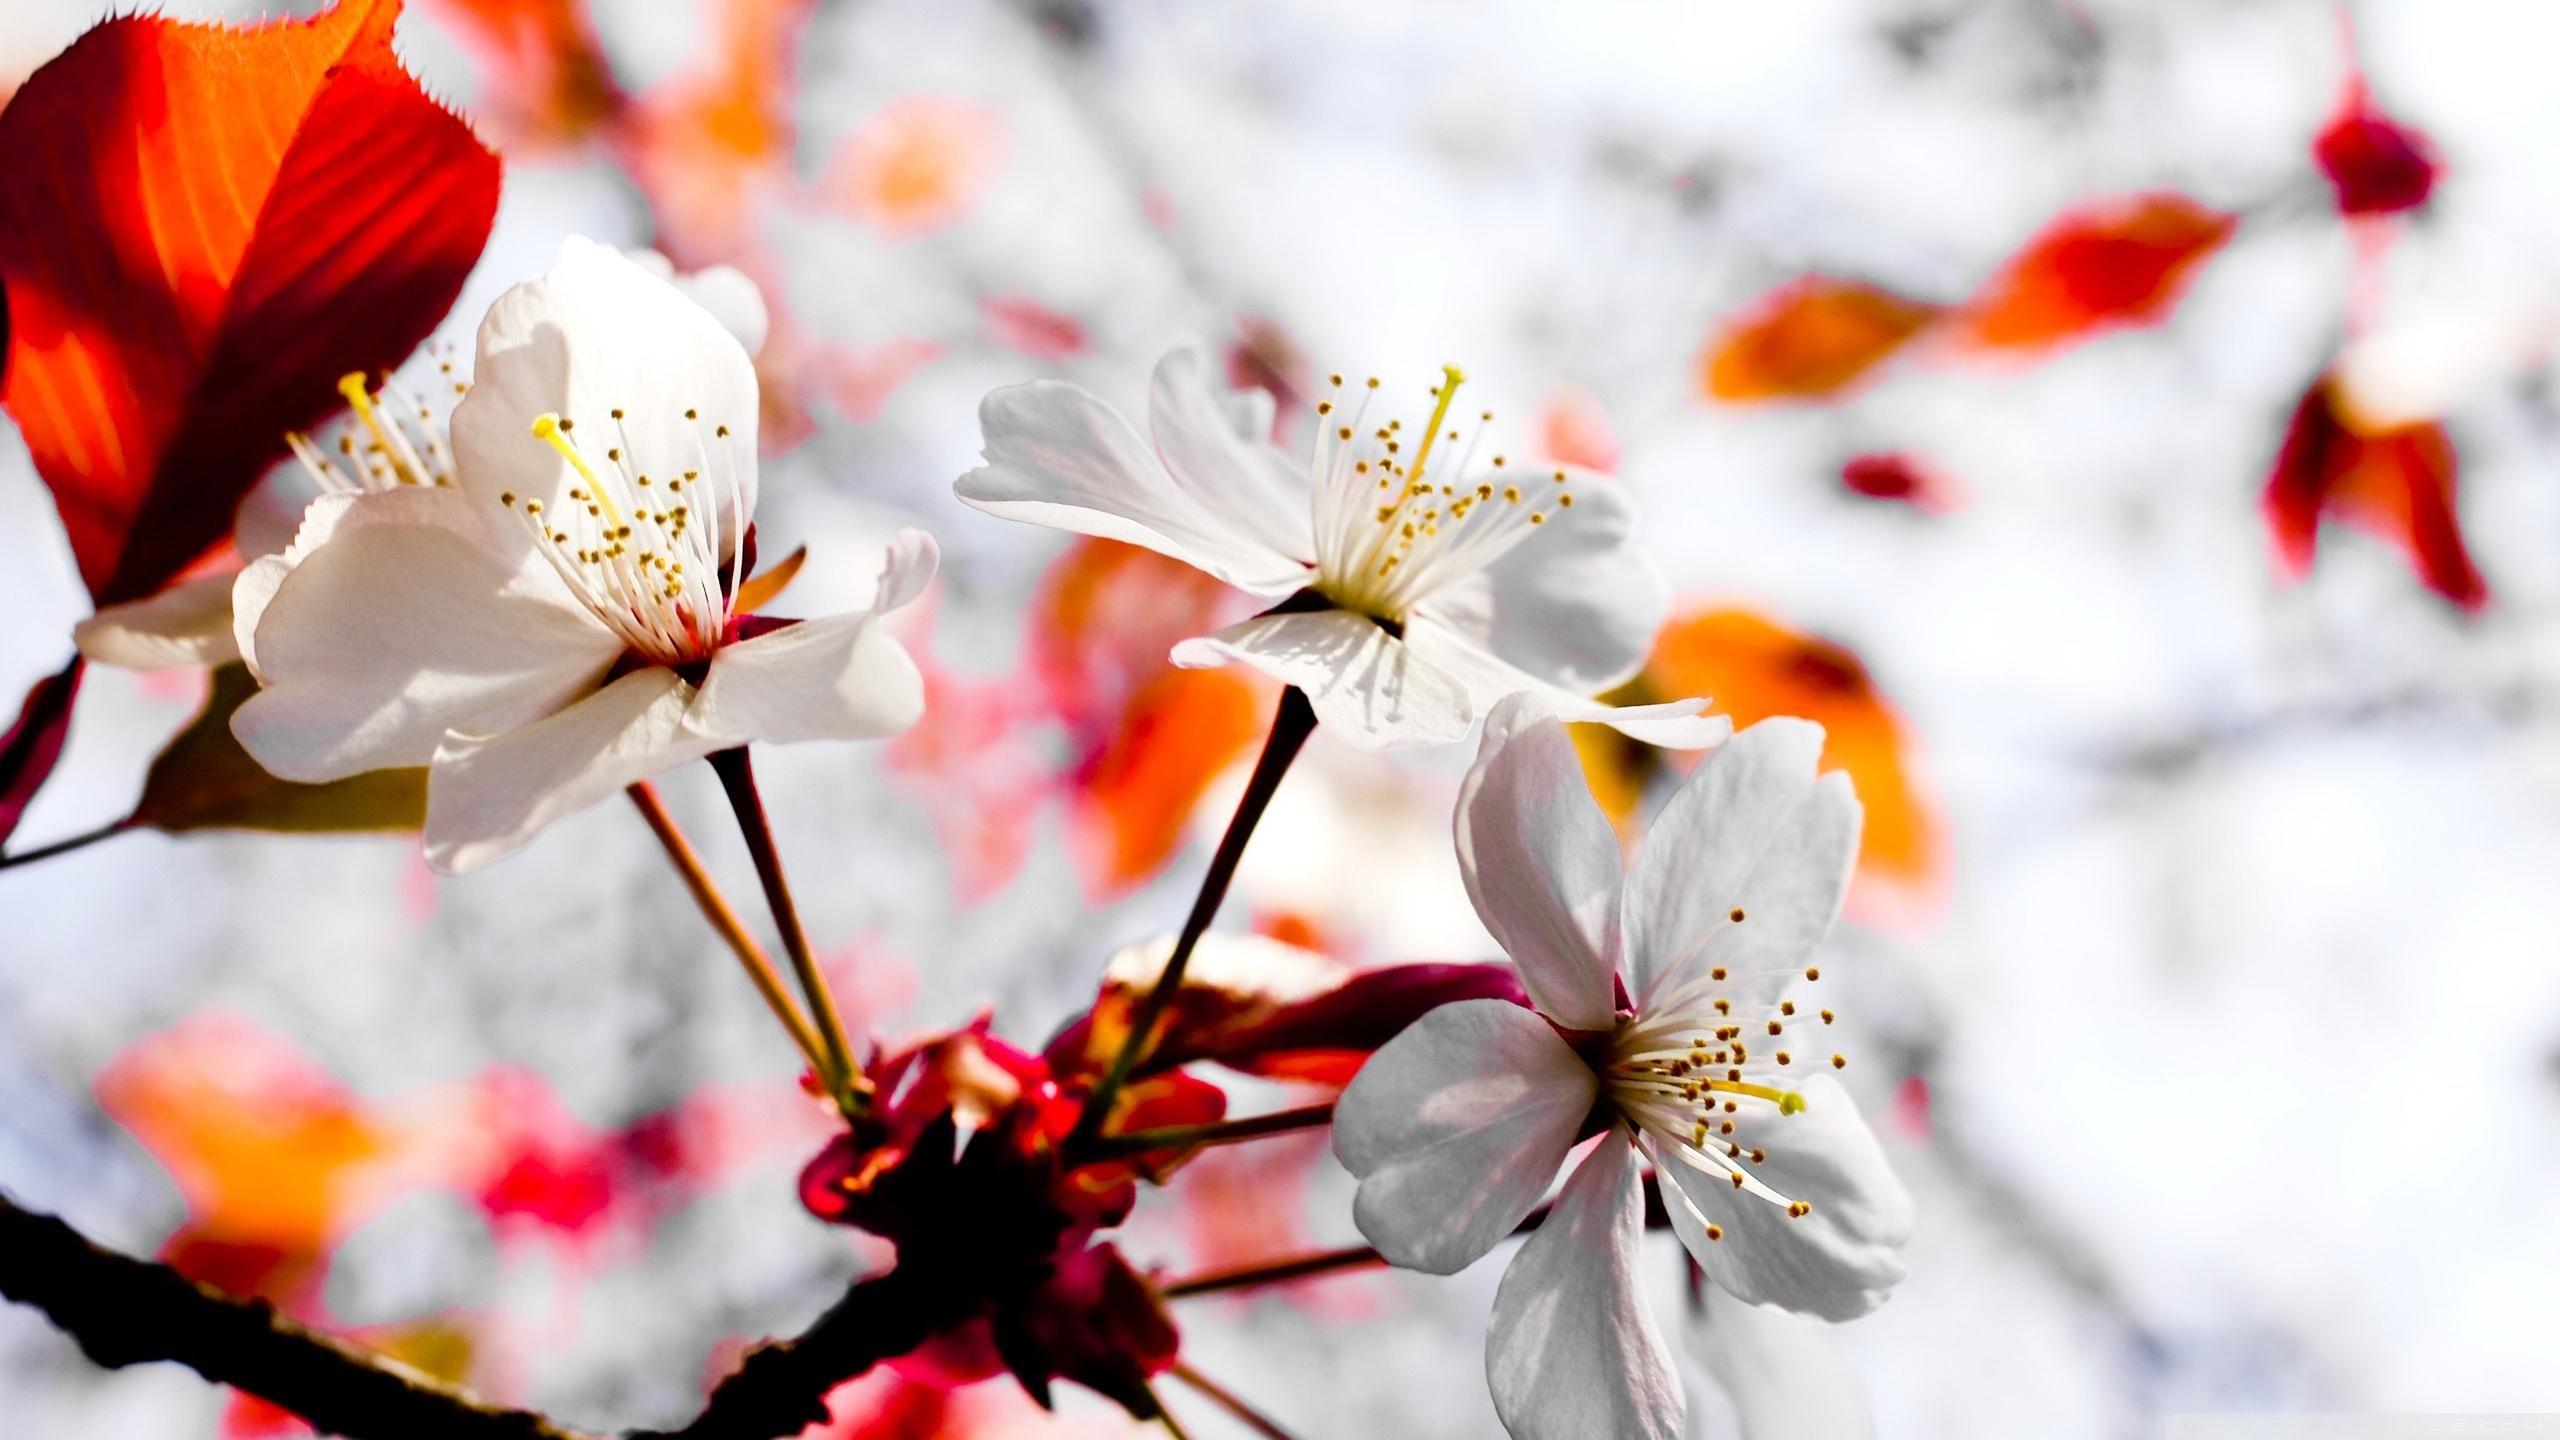 Wallpaper Hd For Desktop Full Screen 1080p 49 Pictures Spring Wallpaper Spring Season Flowers Hd Flower Wallpaper